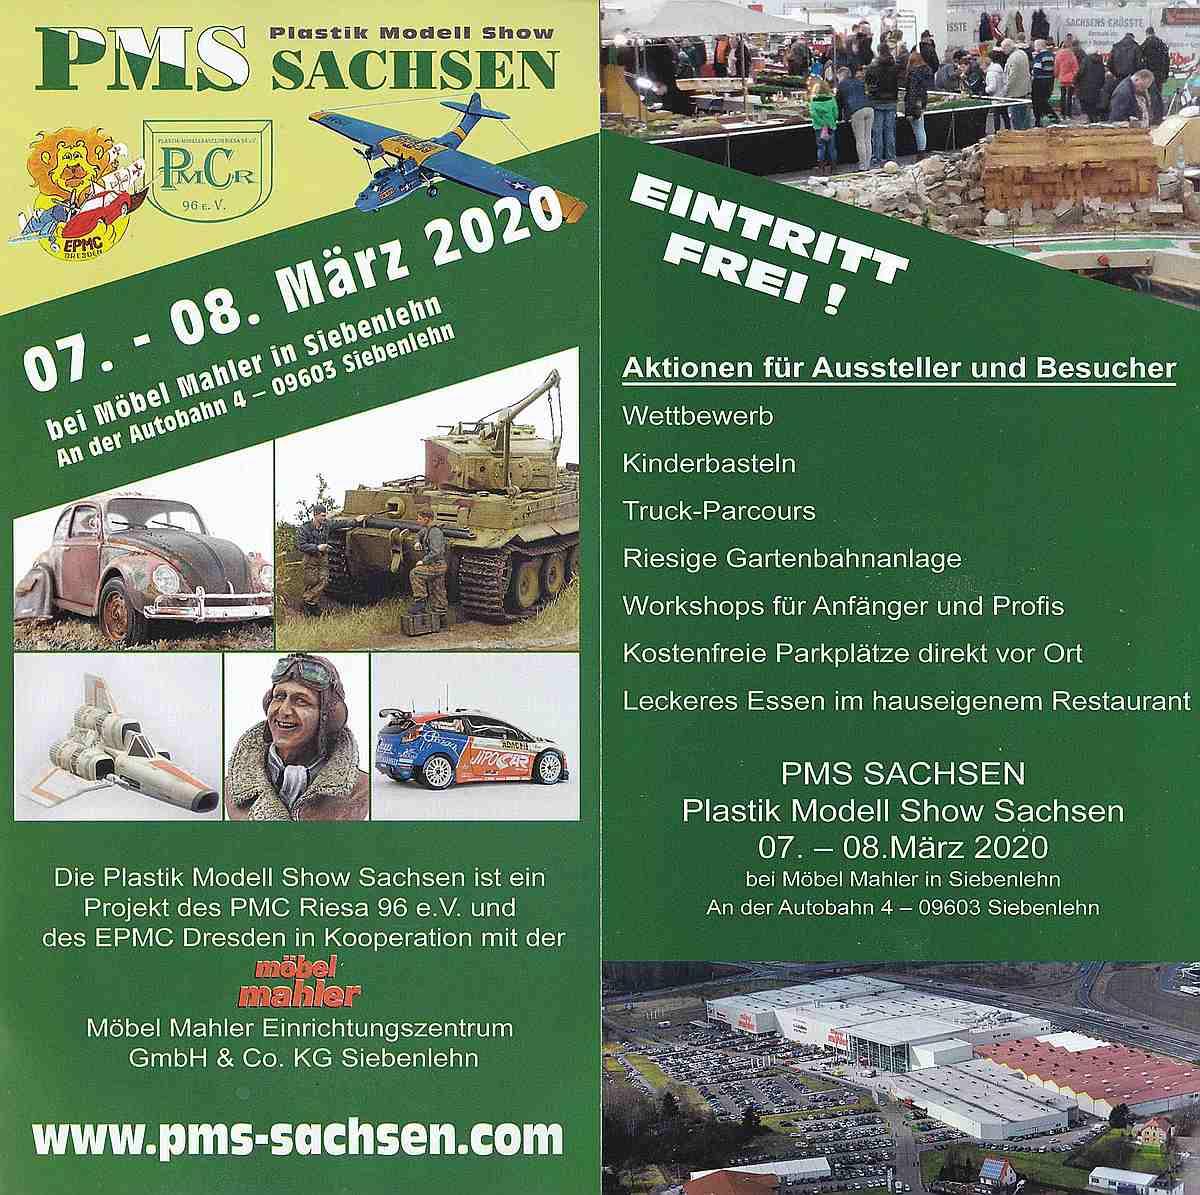 PMS-Sachsen-2020-2 Plastik Modell Show Sachsen am 7./8. März 2020